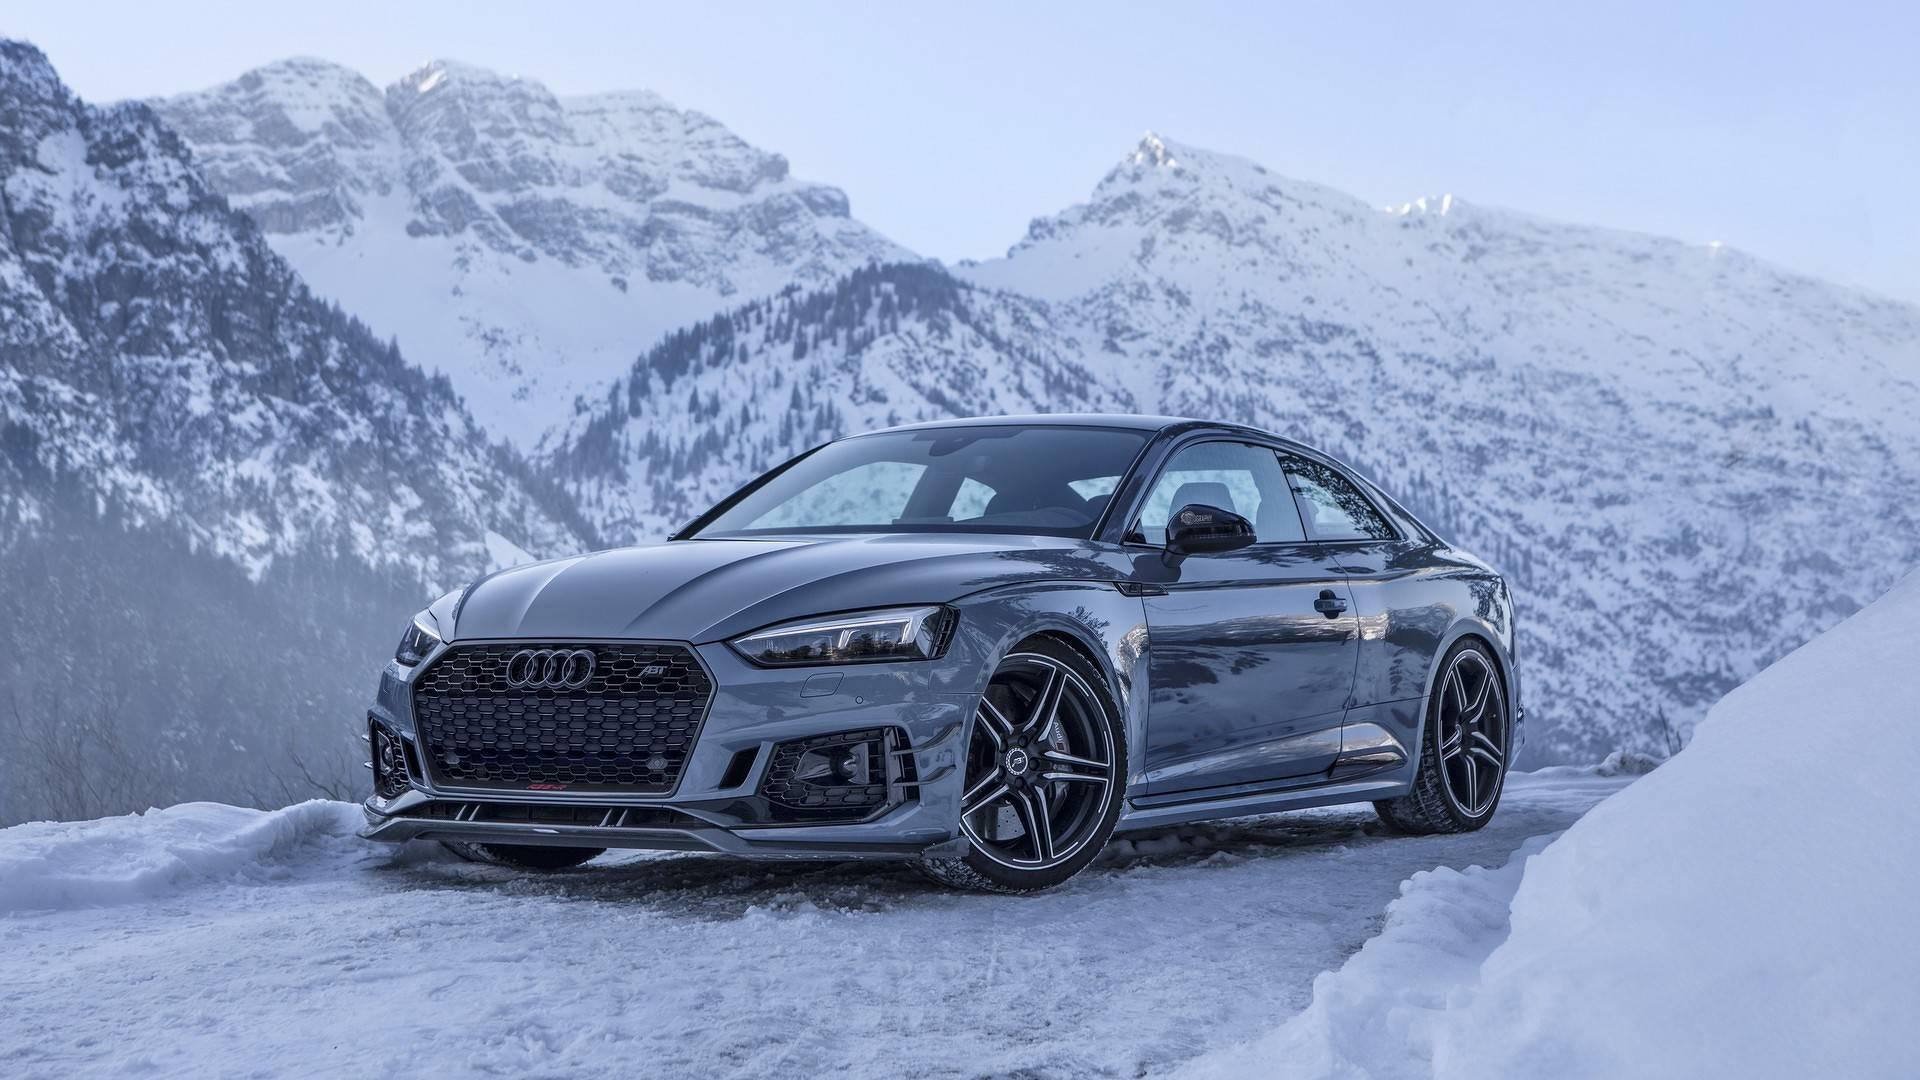 Porsche Boxster Wallpaper Hd Abt Audi Rs5 R On The Austrian Alps Exotic Car List